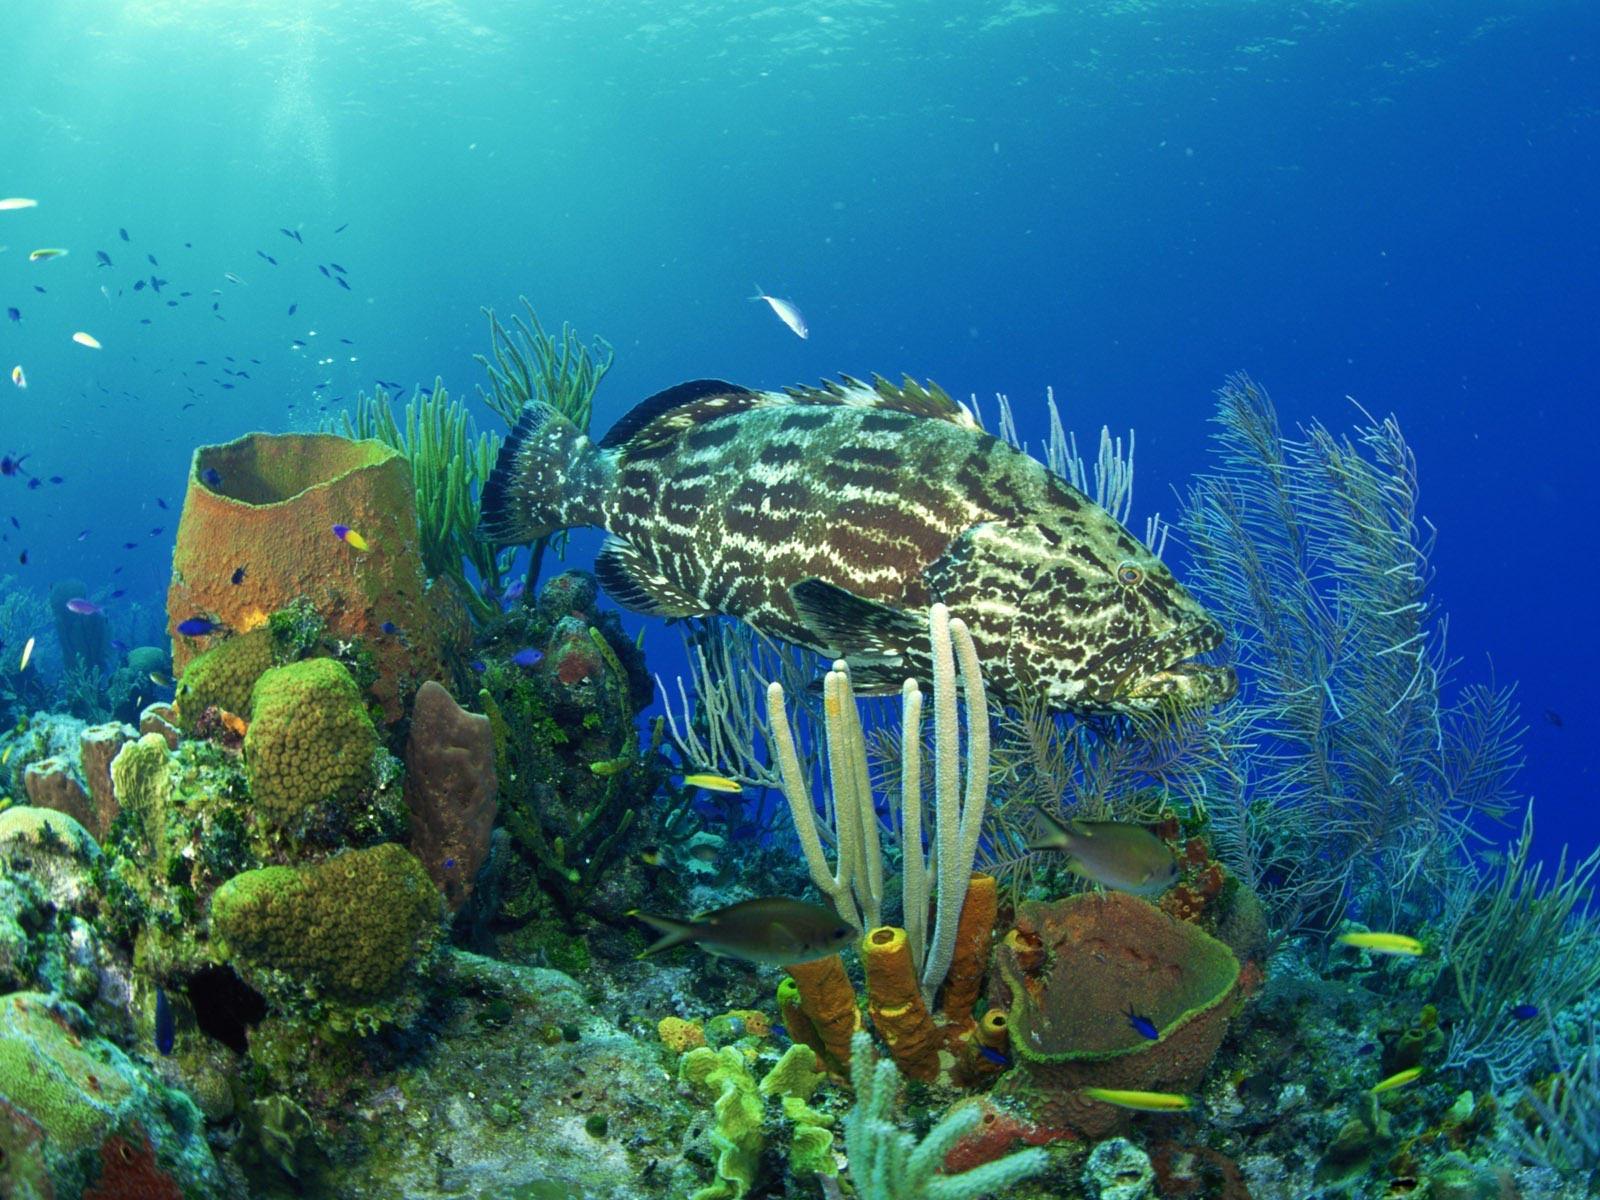 underwater life Wallpaper High Quality WallpapersWallpaper Desktop 1600x1200